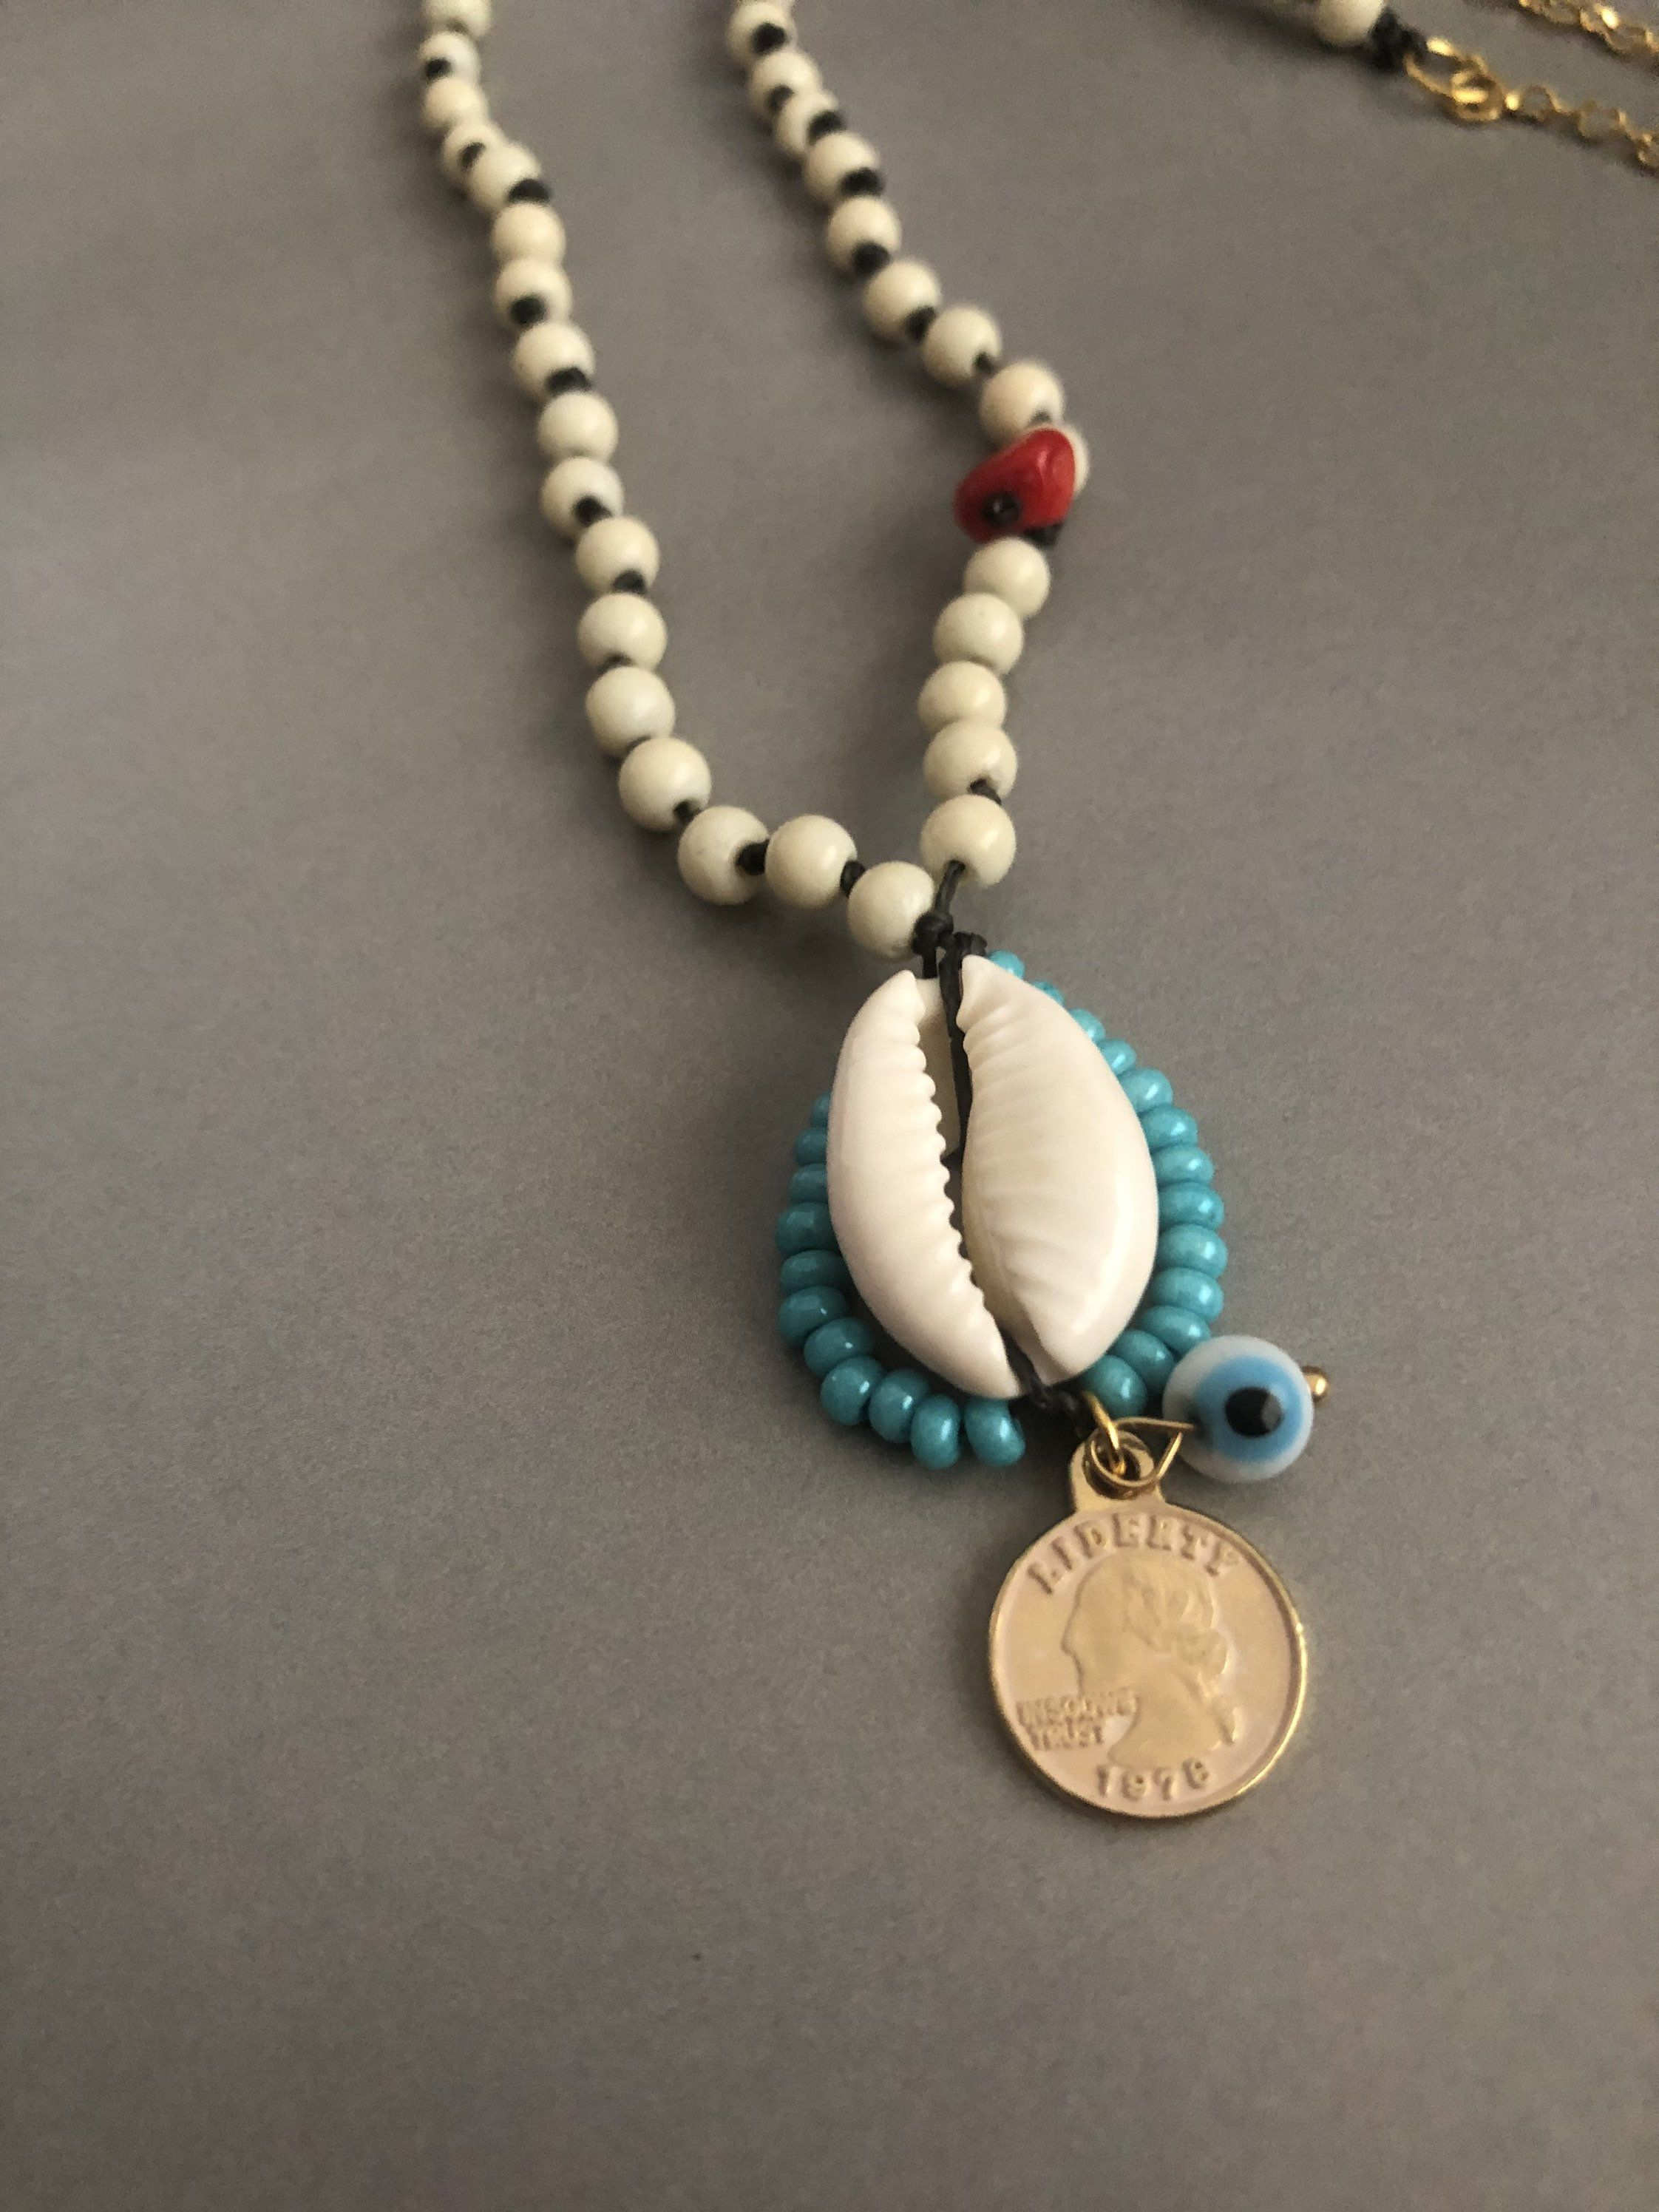 teardrop Czech glass bead necklace Blue necklace Czech glass seed bead necklace gift for her statement necklace layering necklace